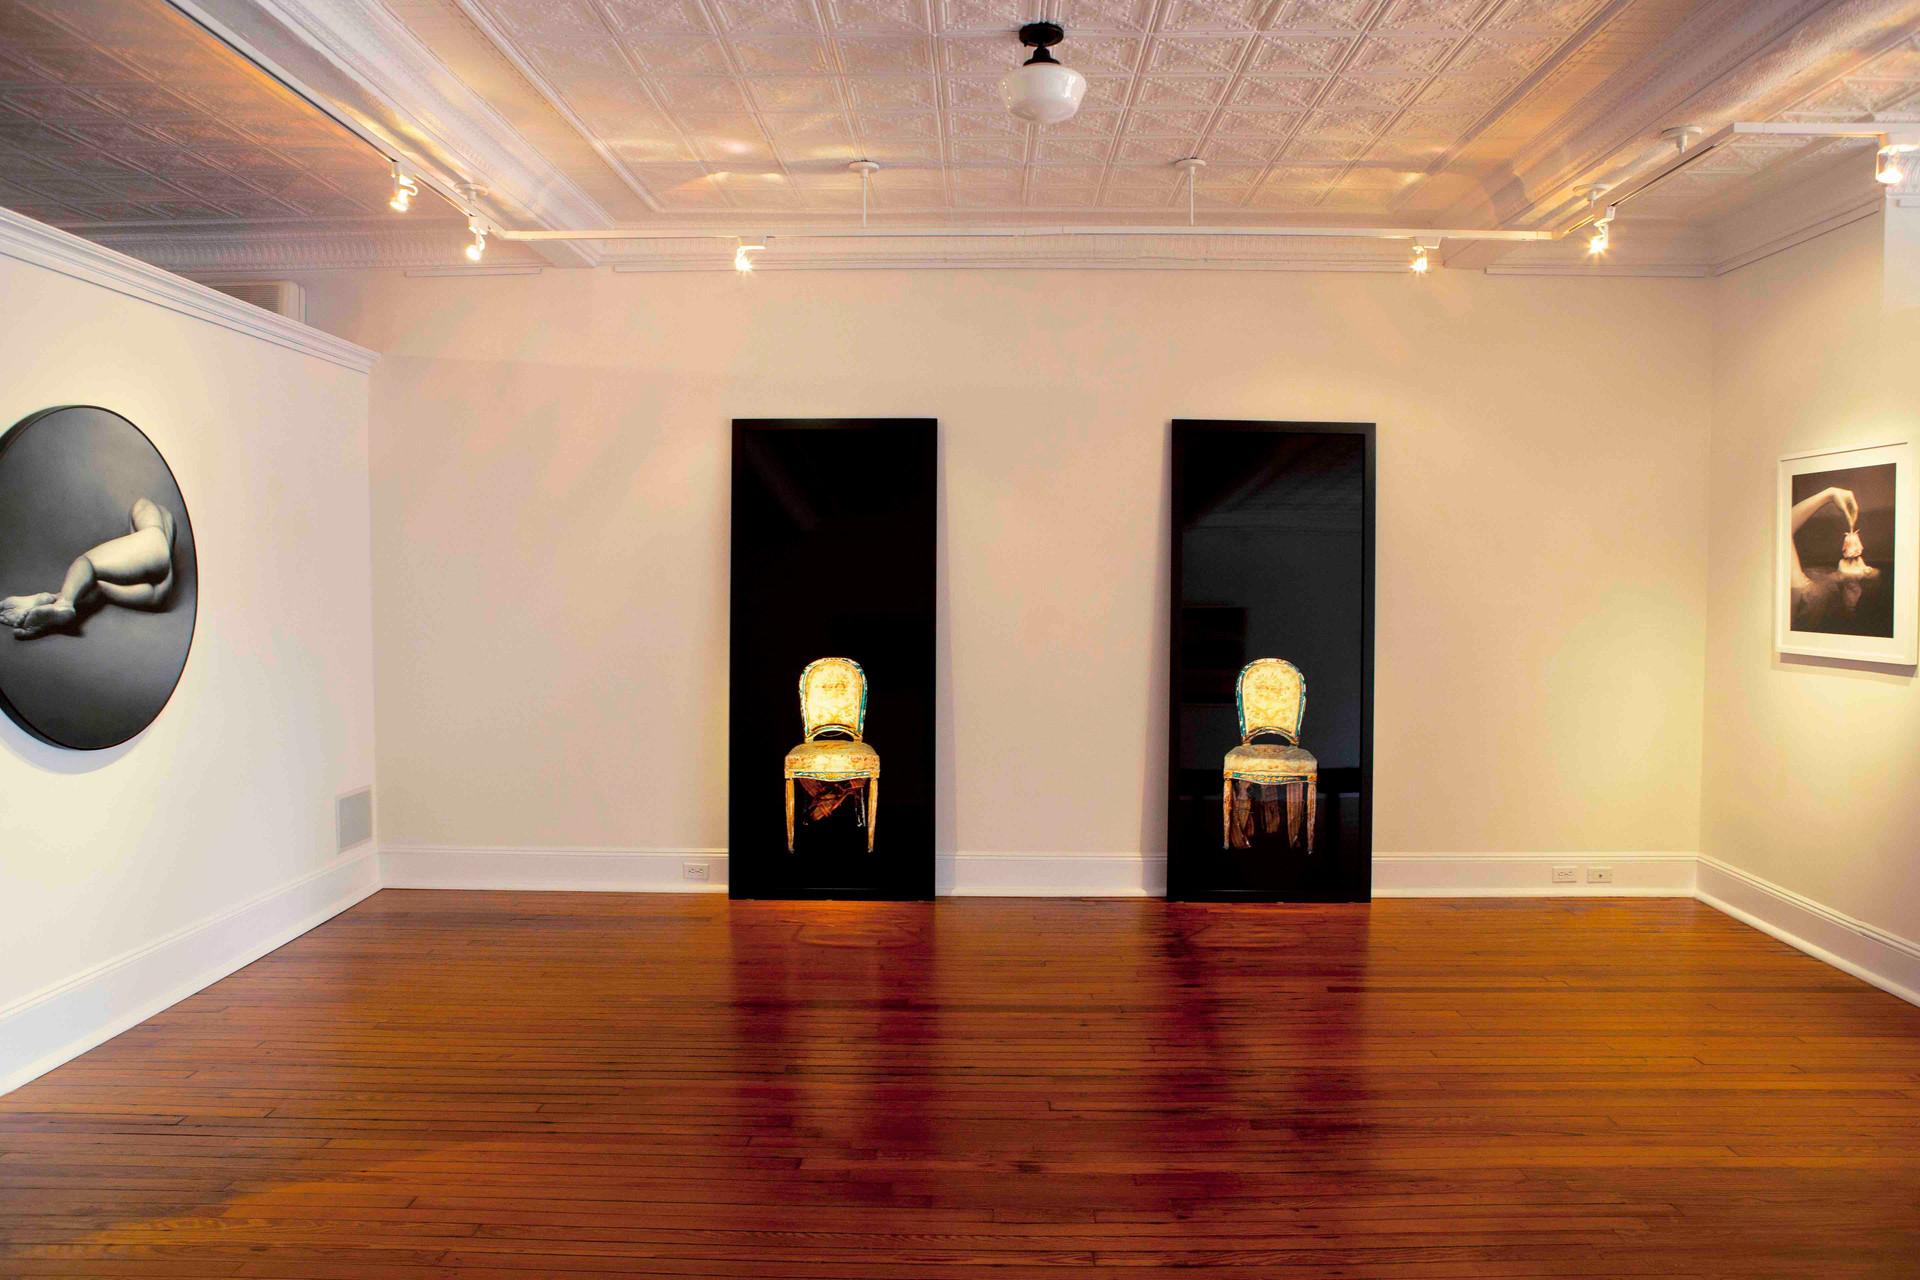 Tragic Chairs by Dianne Blell, M&M Fine Art, 2019